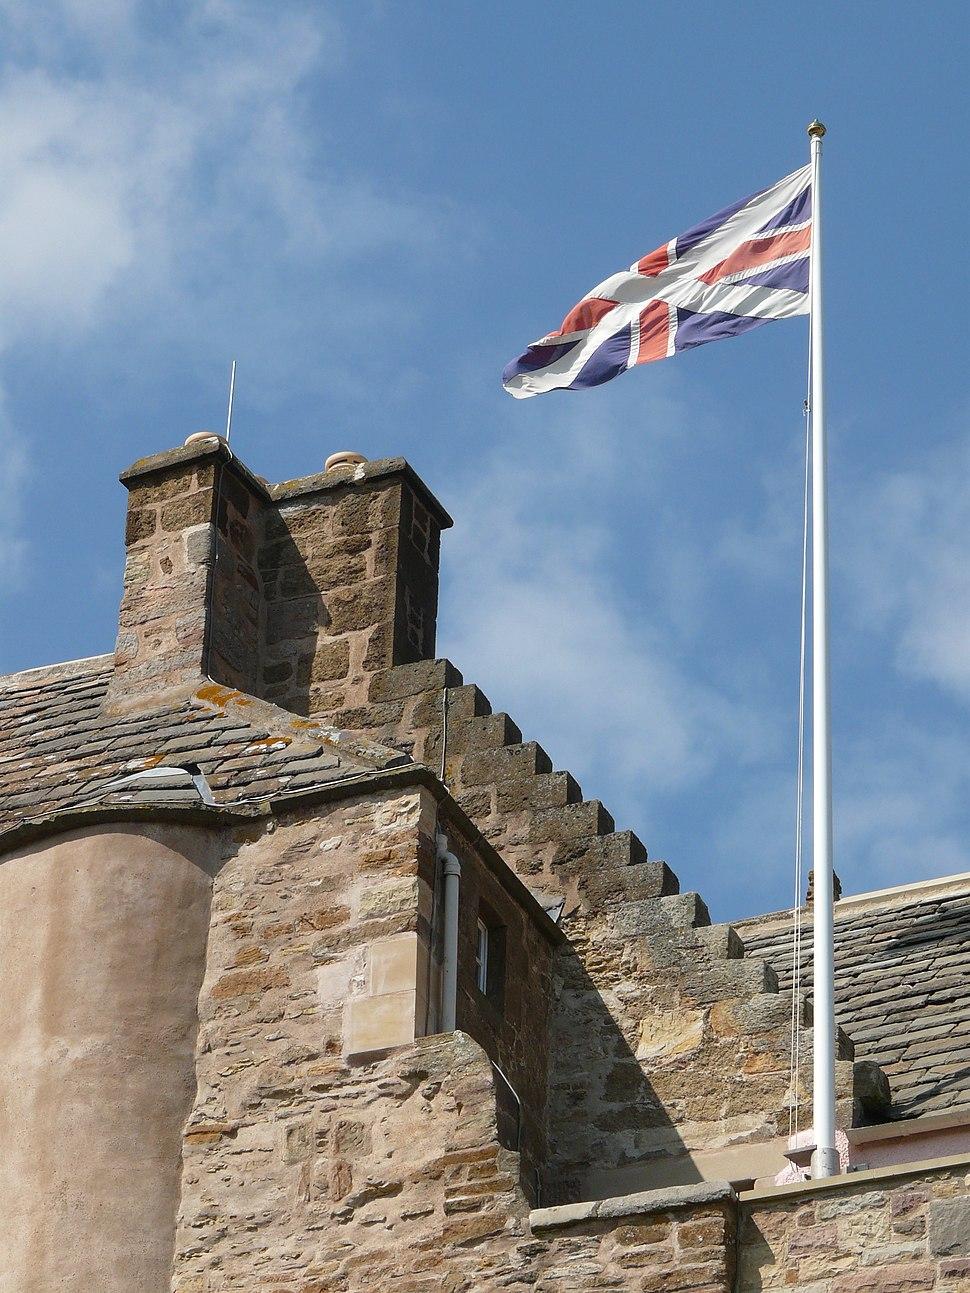 Scottish Union Flag at Lennoxlove House, East Lothian, Scotland.